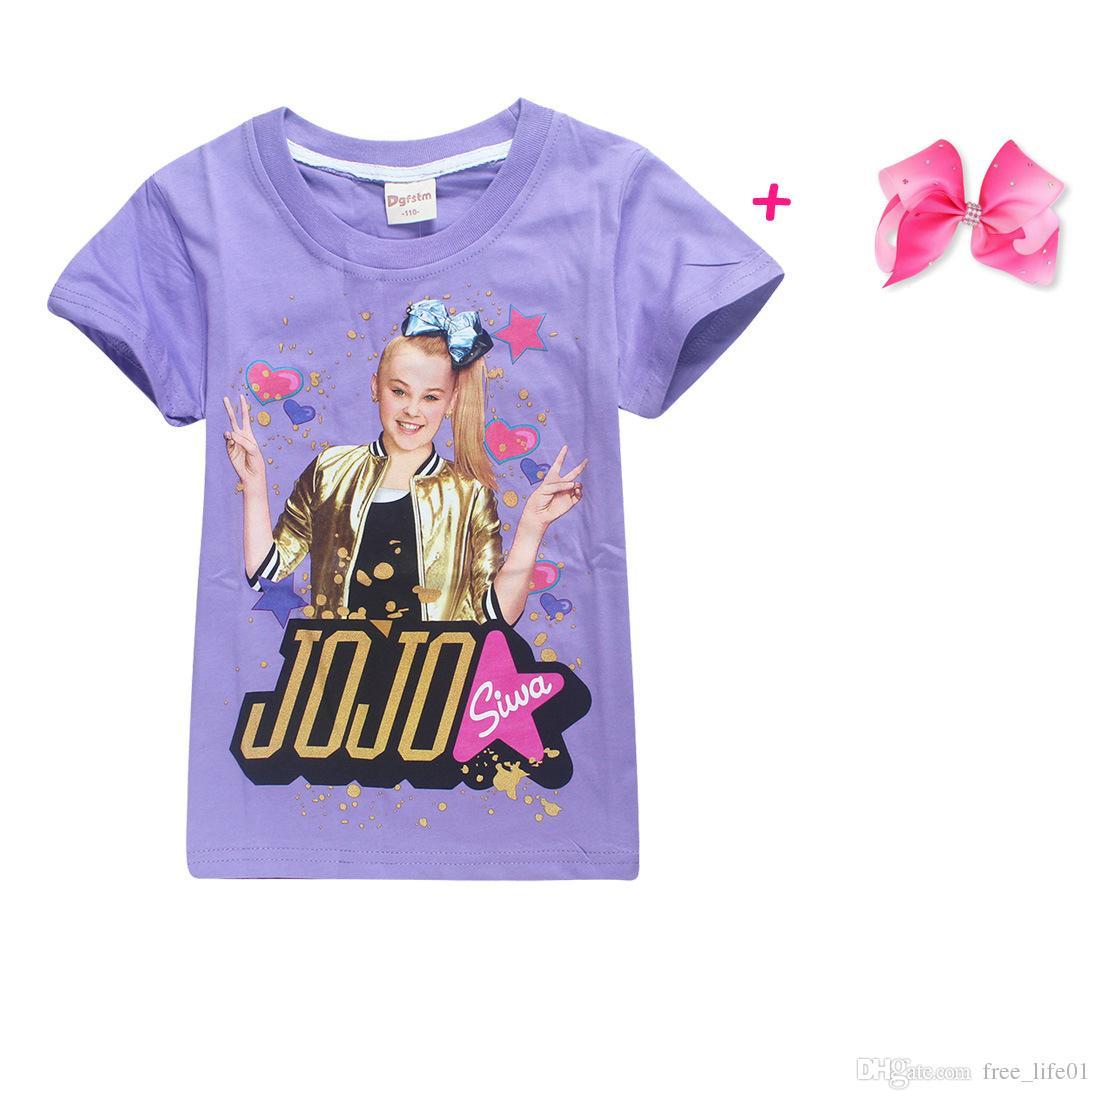 76b9178f72 2019 2018 New Children Summer T Shirt Girls Boys Clothes Jo8jo Si wa  Clothing Short Sleeve T Shirt Kids Cartoon Cotton Tshirt Tops Tees From  Free life01